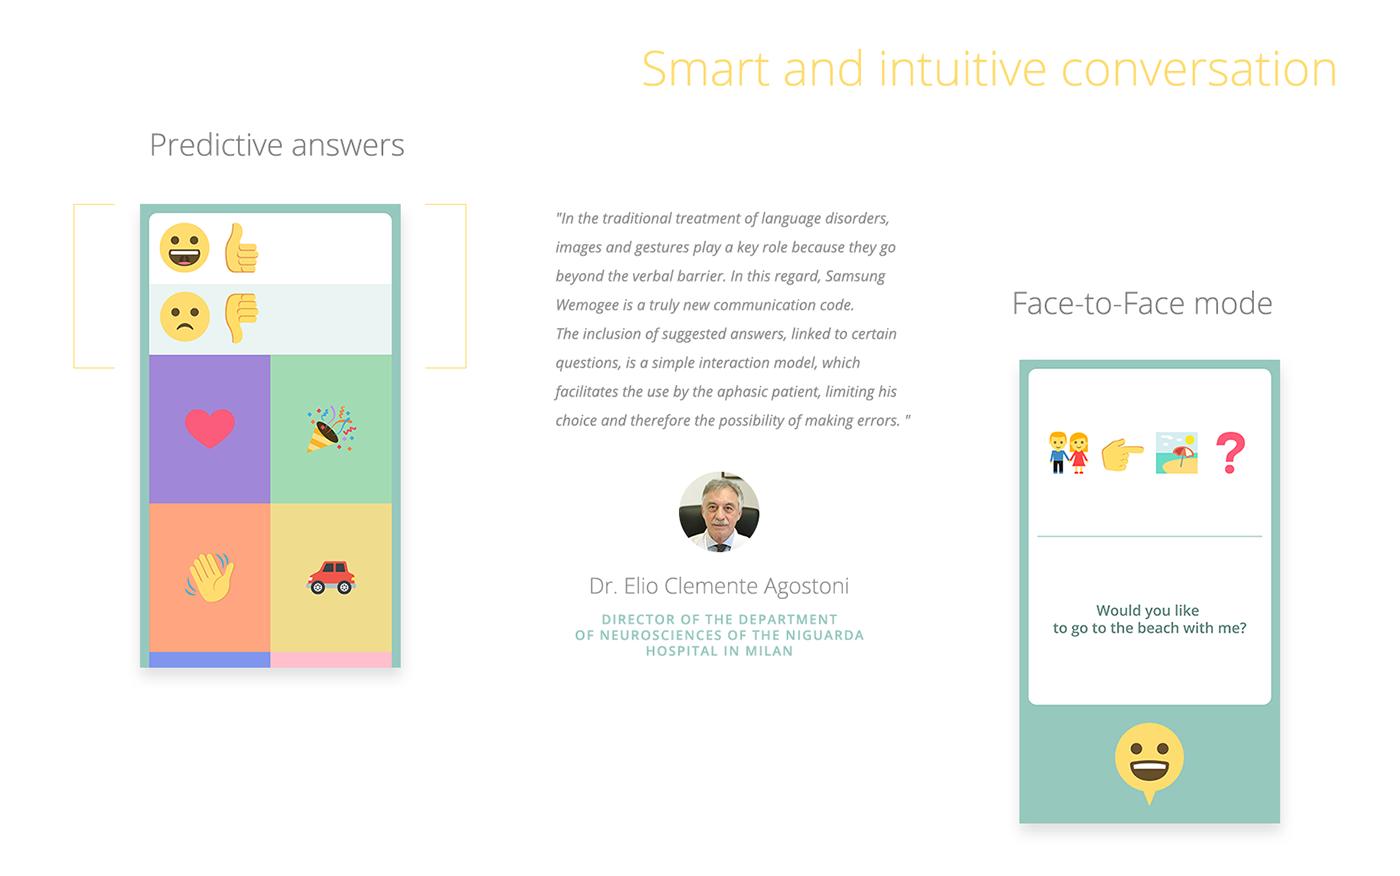 app wemogee Samsung aphasia afasia Health medical Emoji Pharma ux